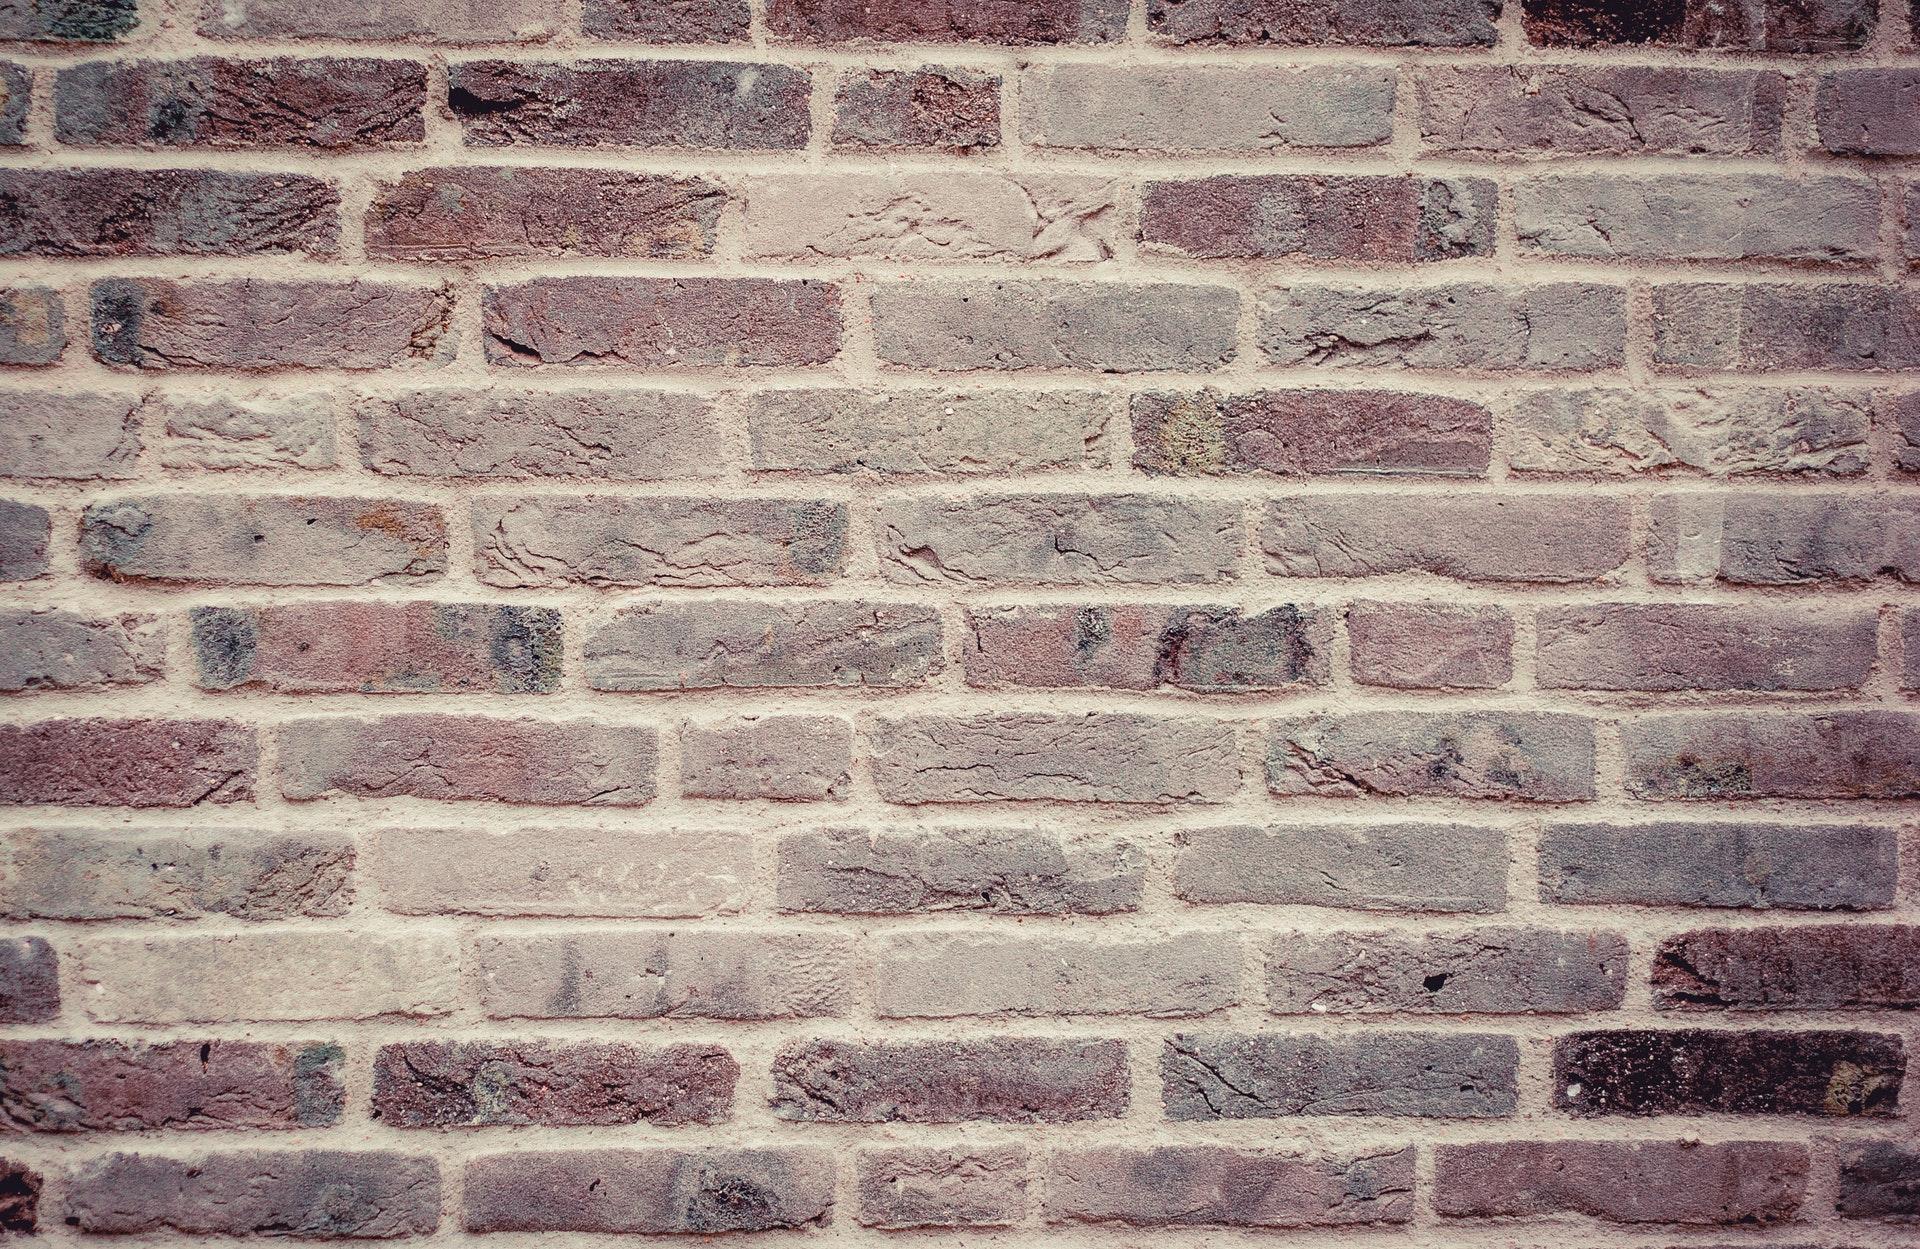 Bricks.jpeg